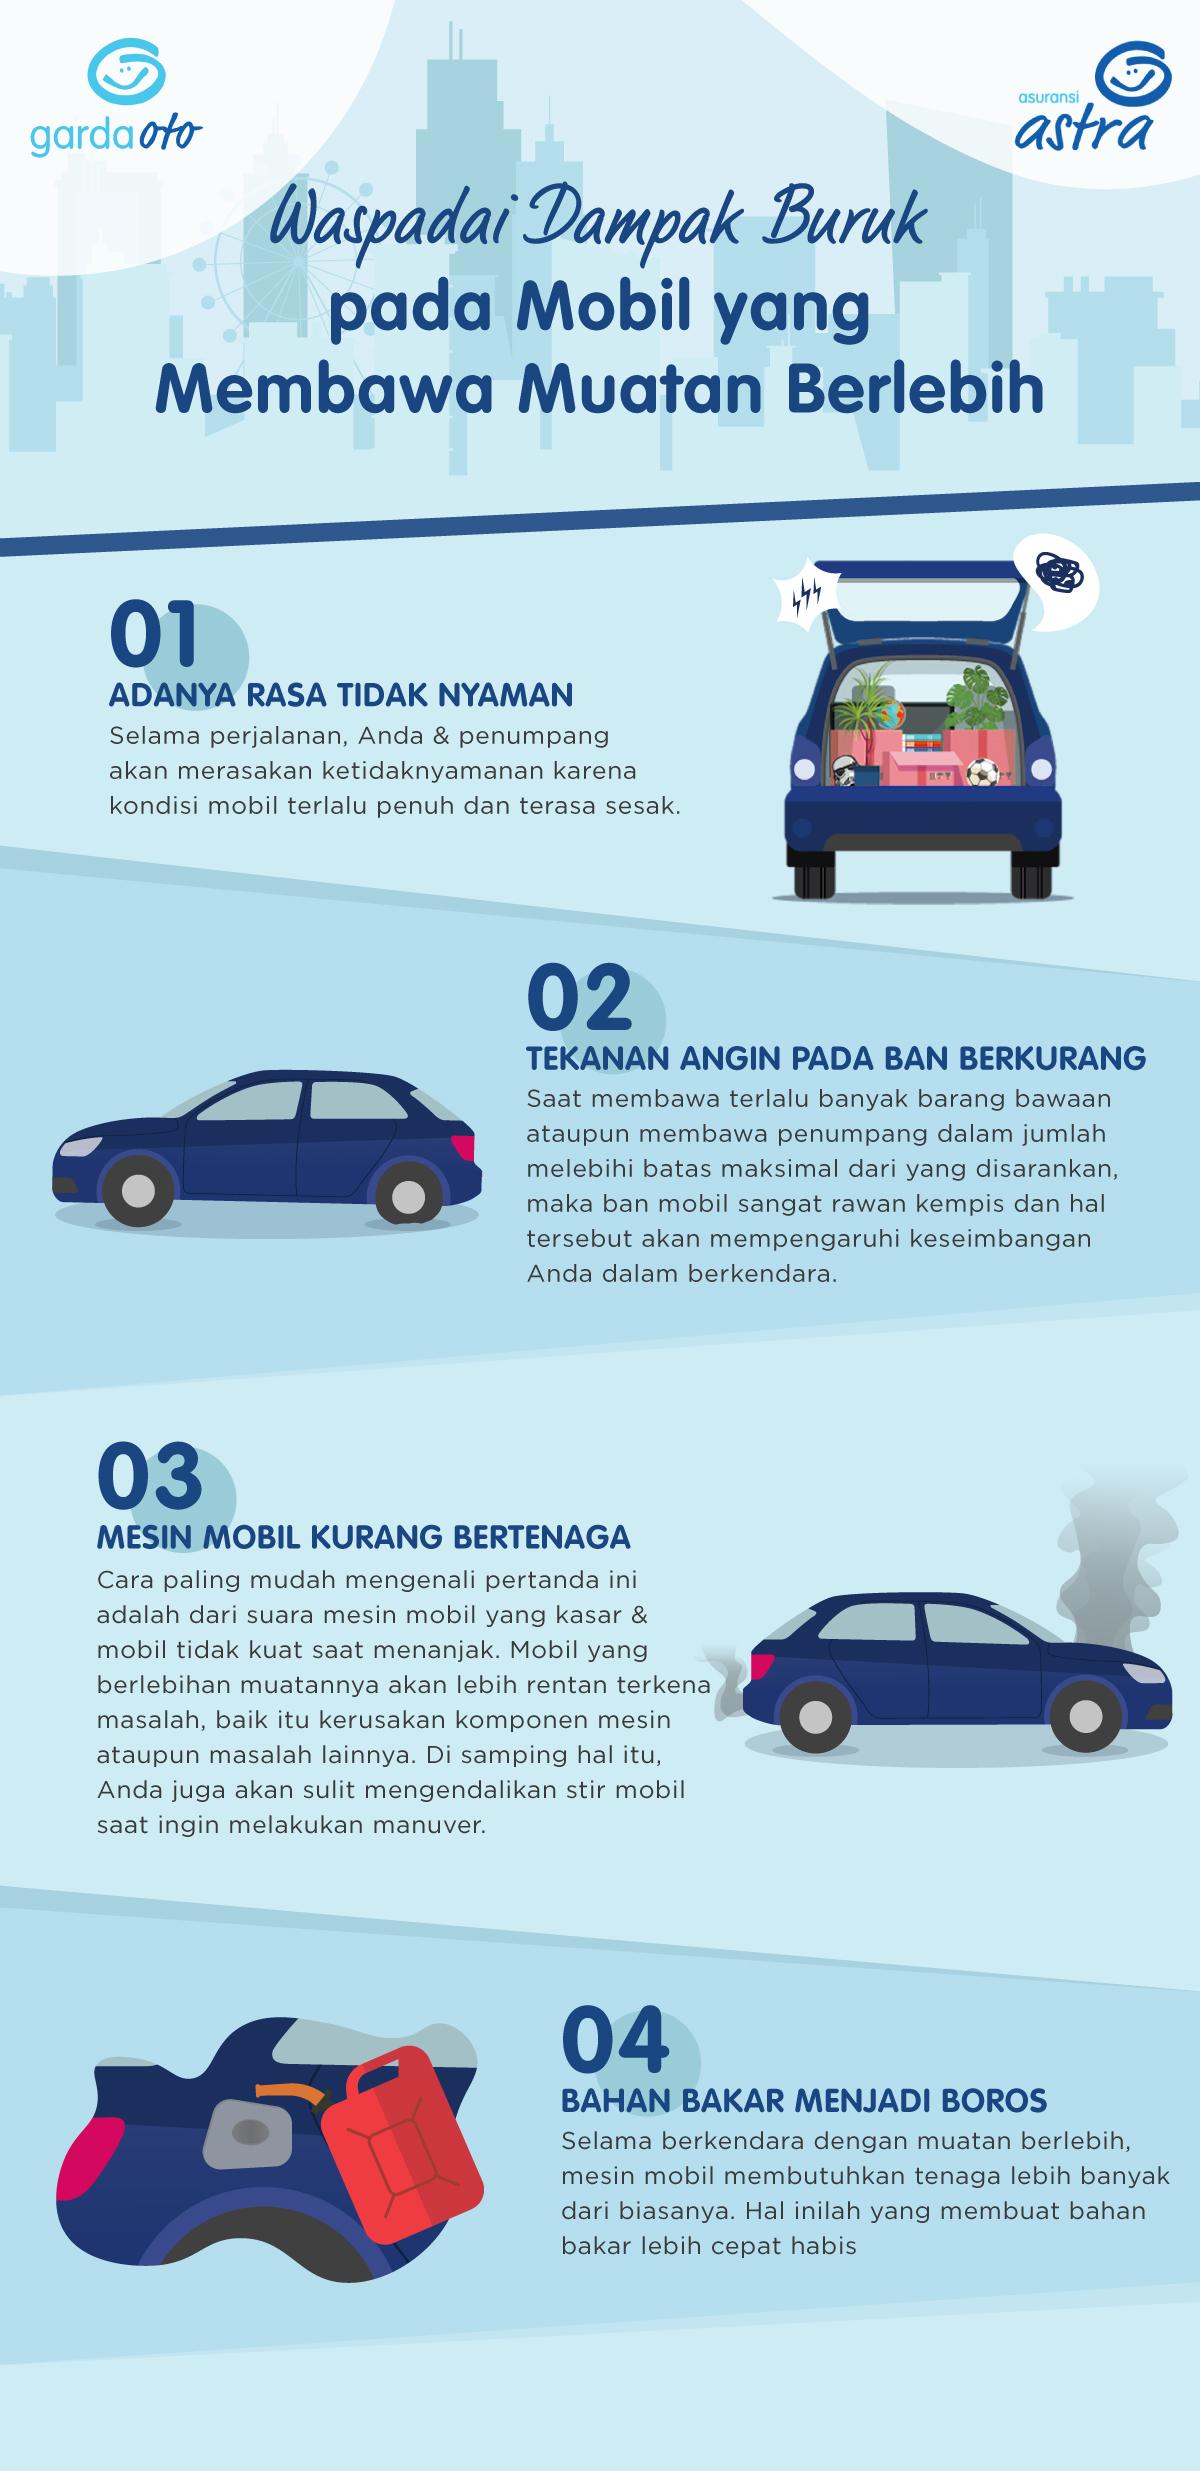 Waspadai Dampak Buruk pada Mobil yang Membawa Muatan Berlebih